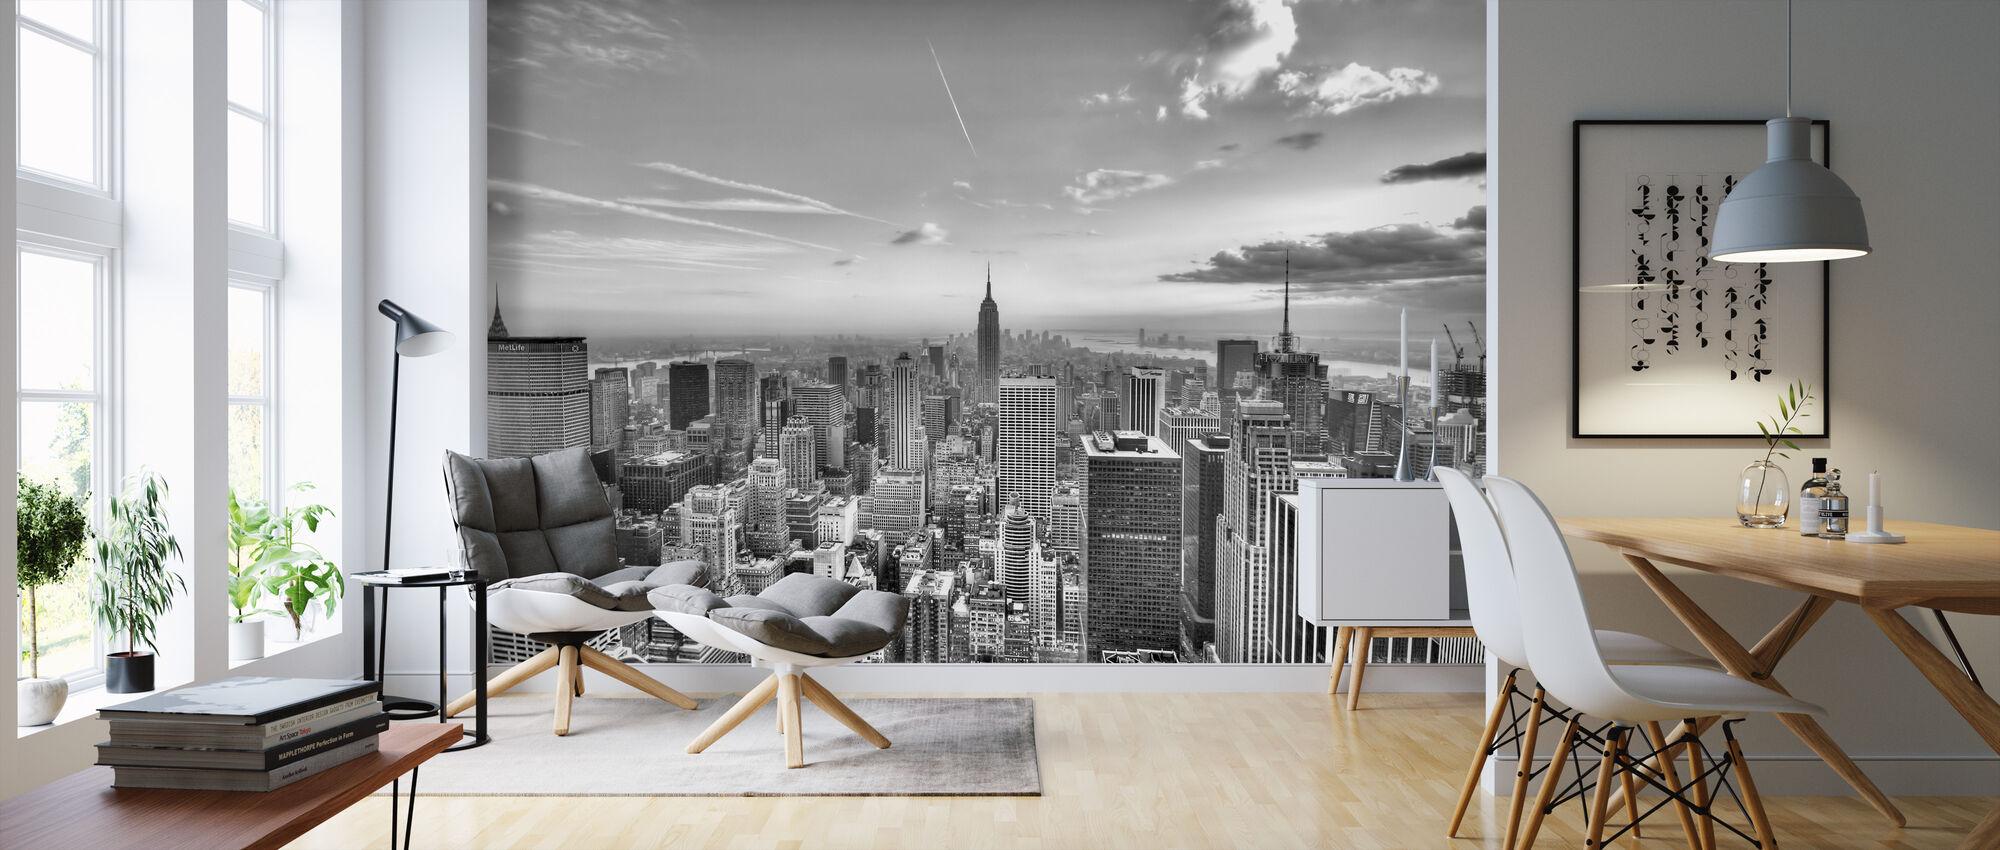 New York City, USA - Wallpaper - Living Room